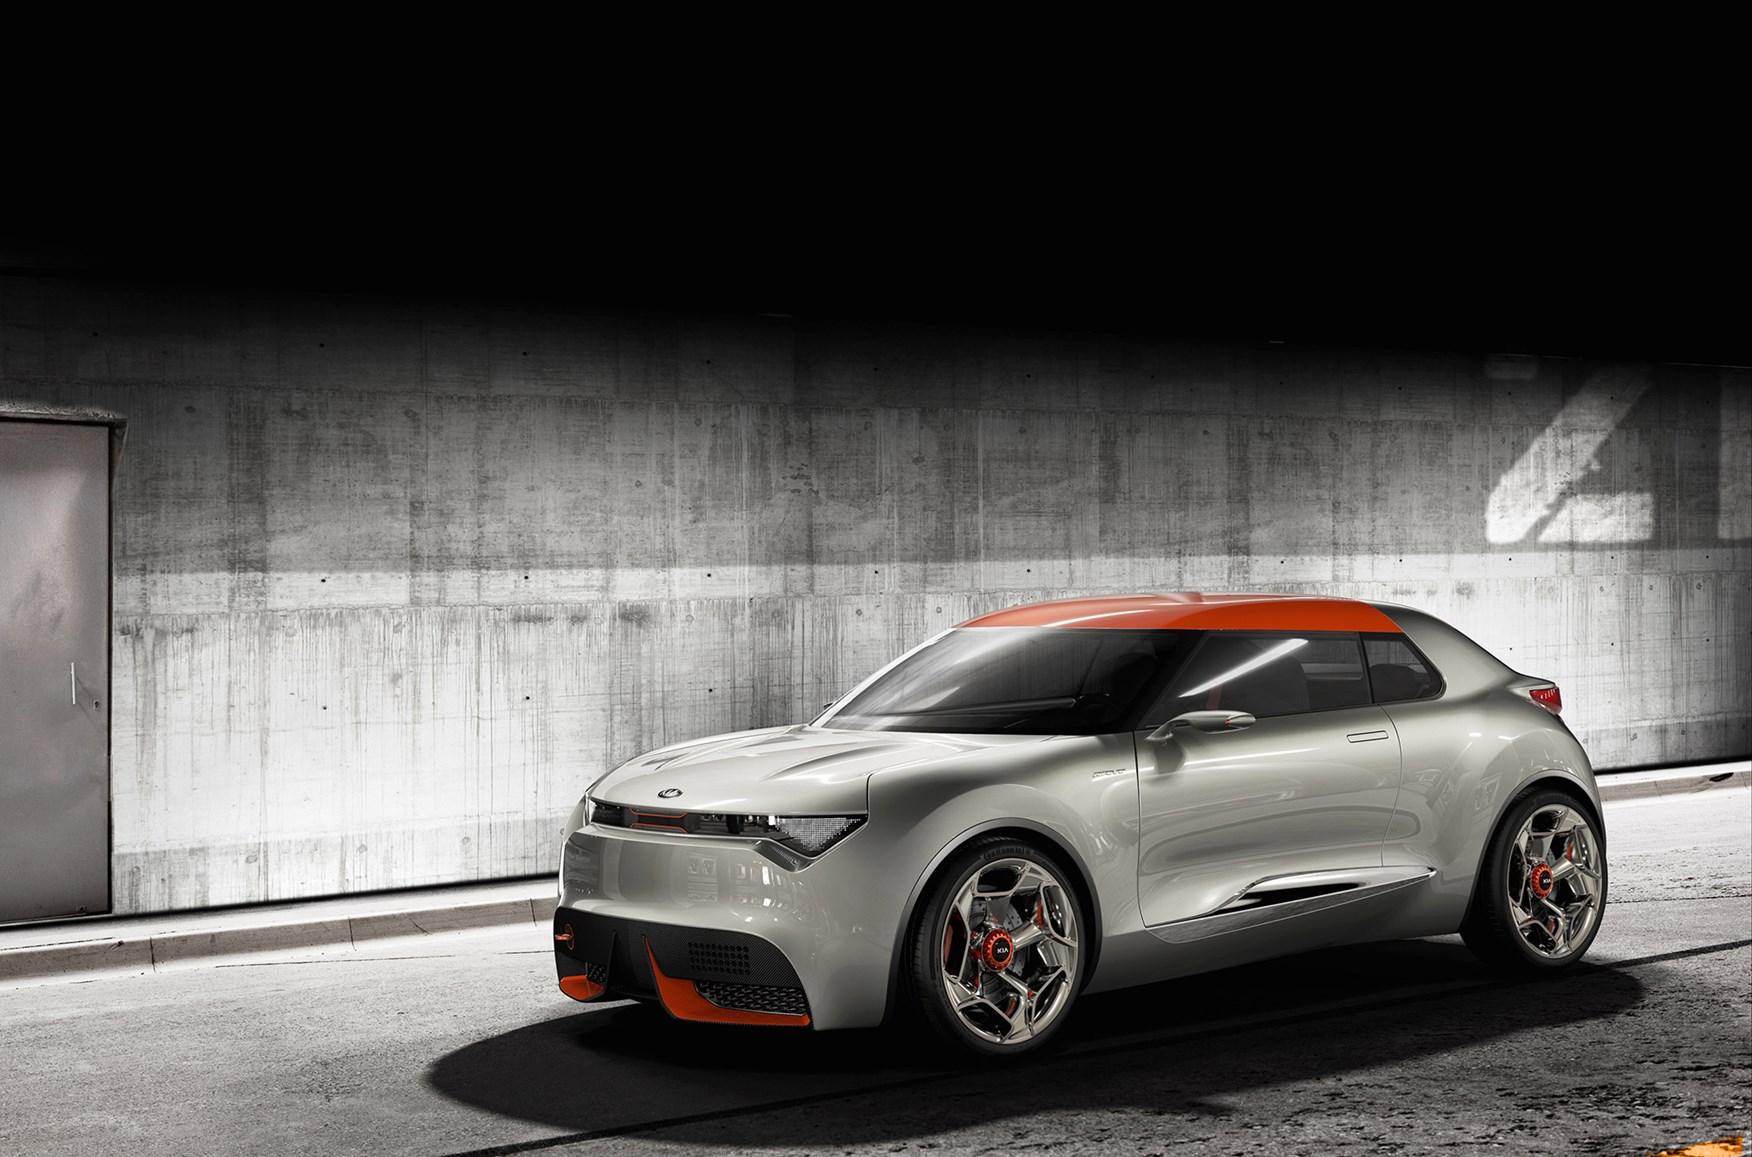 How Kia plans to overtake Citroen Hyundai and Toyota with new